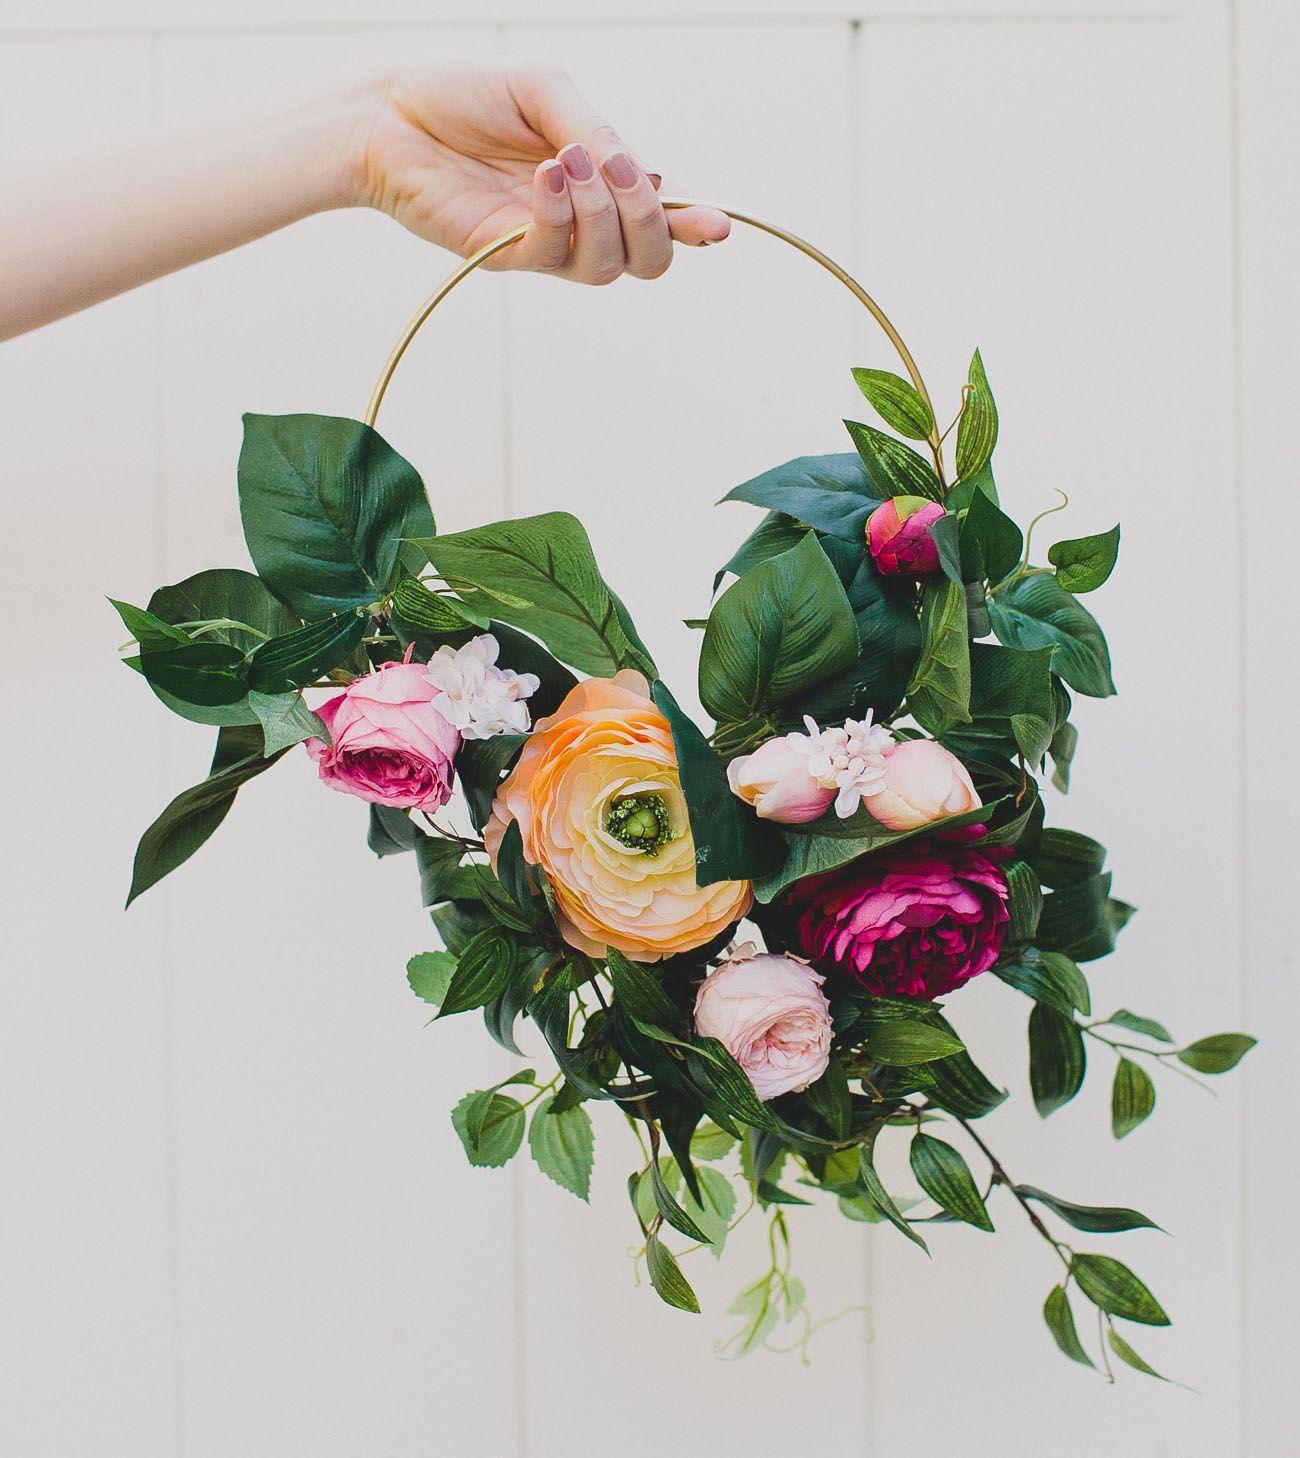 How to DIY a Silk Flower Hoop Bouquet Diy wedding